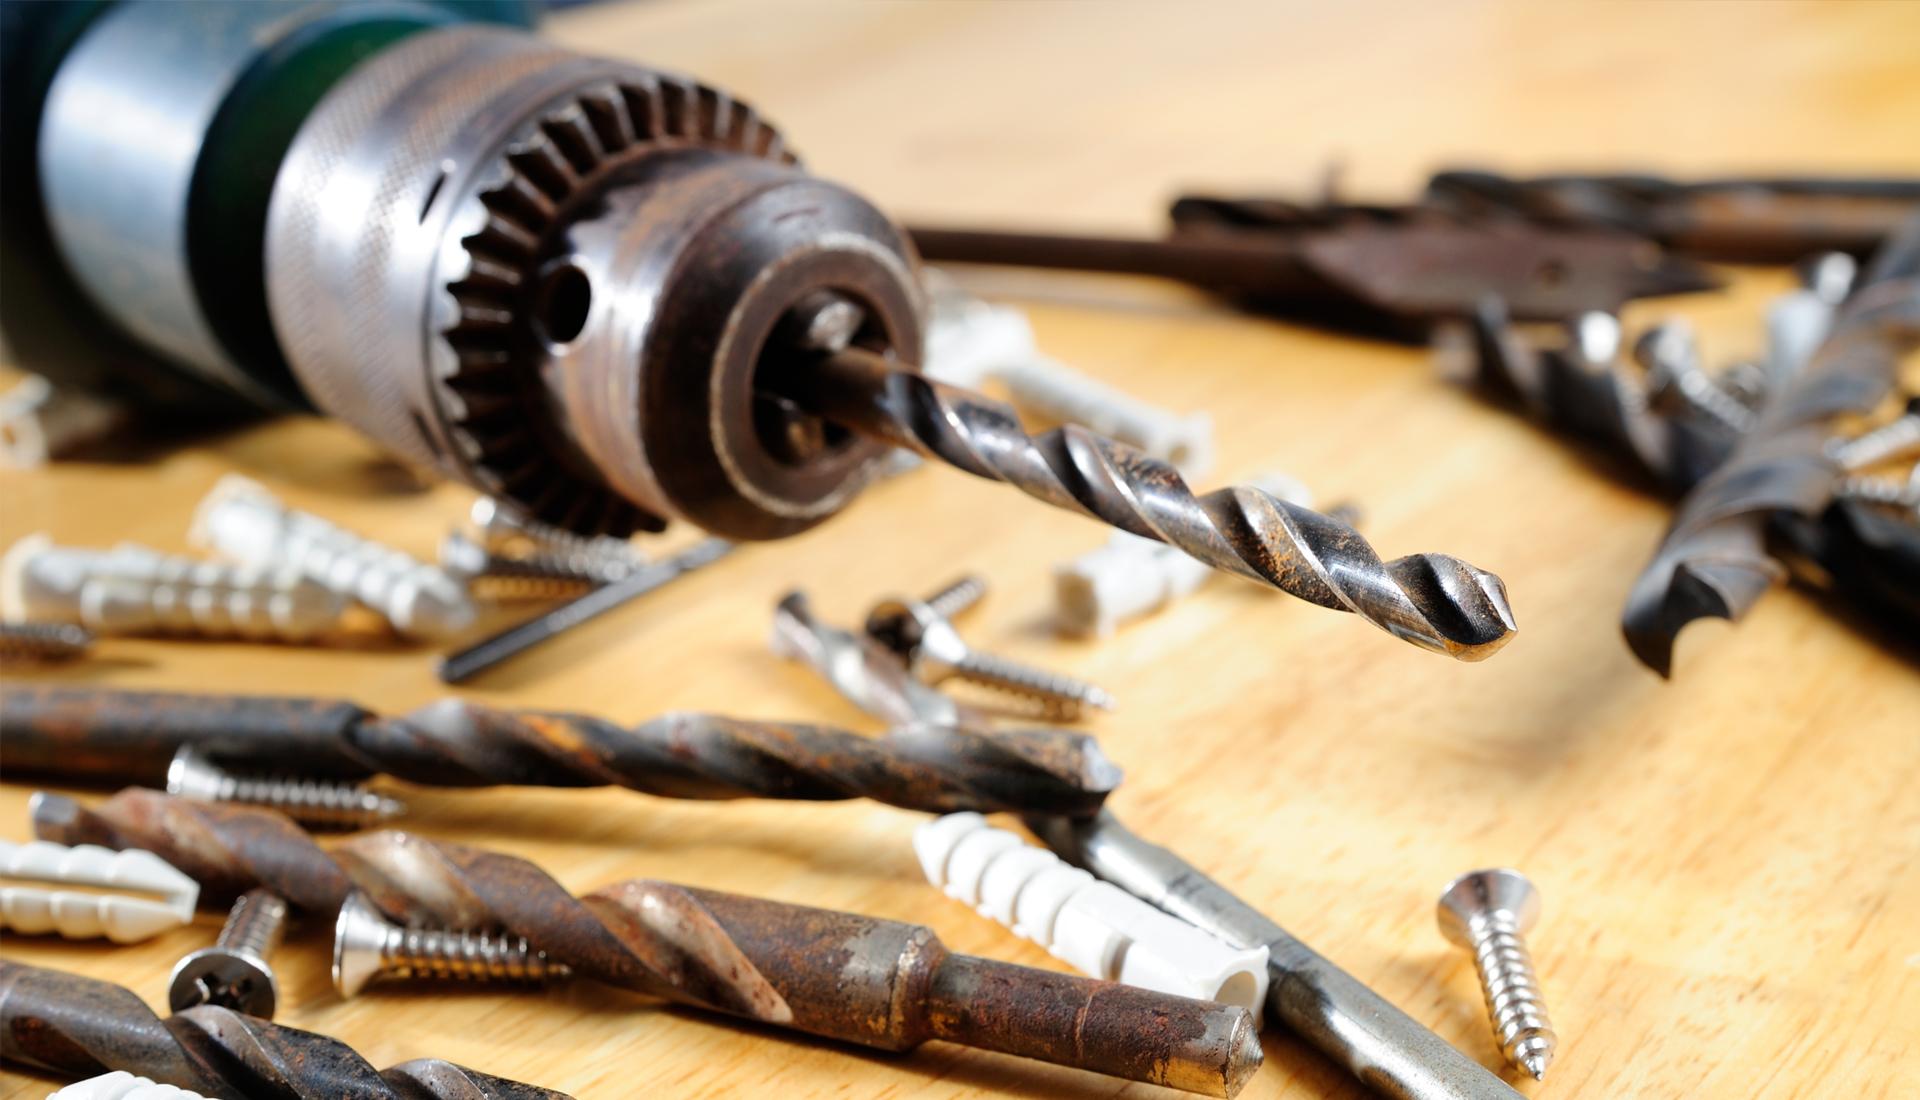 Http Hirharang Com Consider Various Steps Buying Power Tools Via Online Html